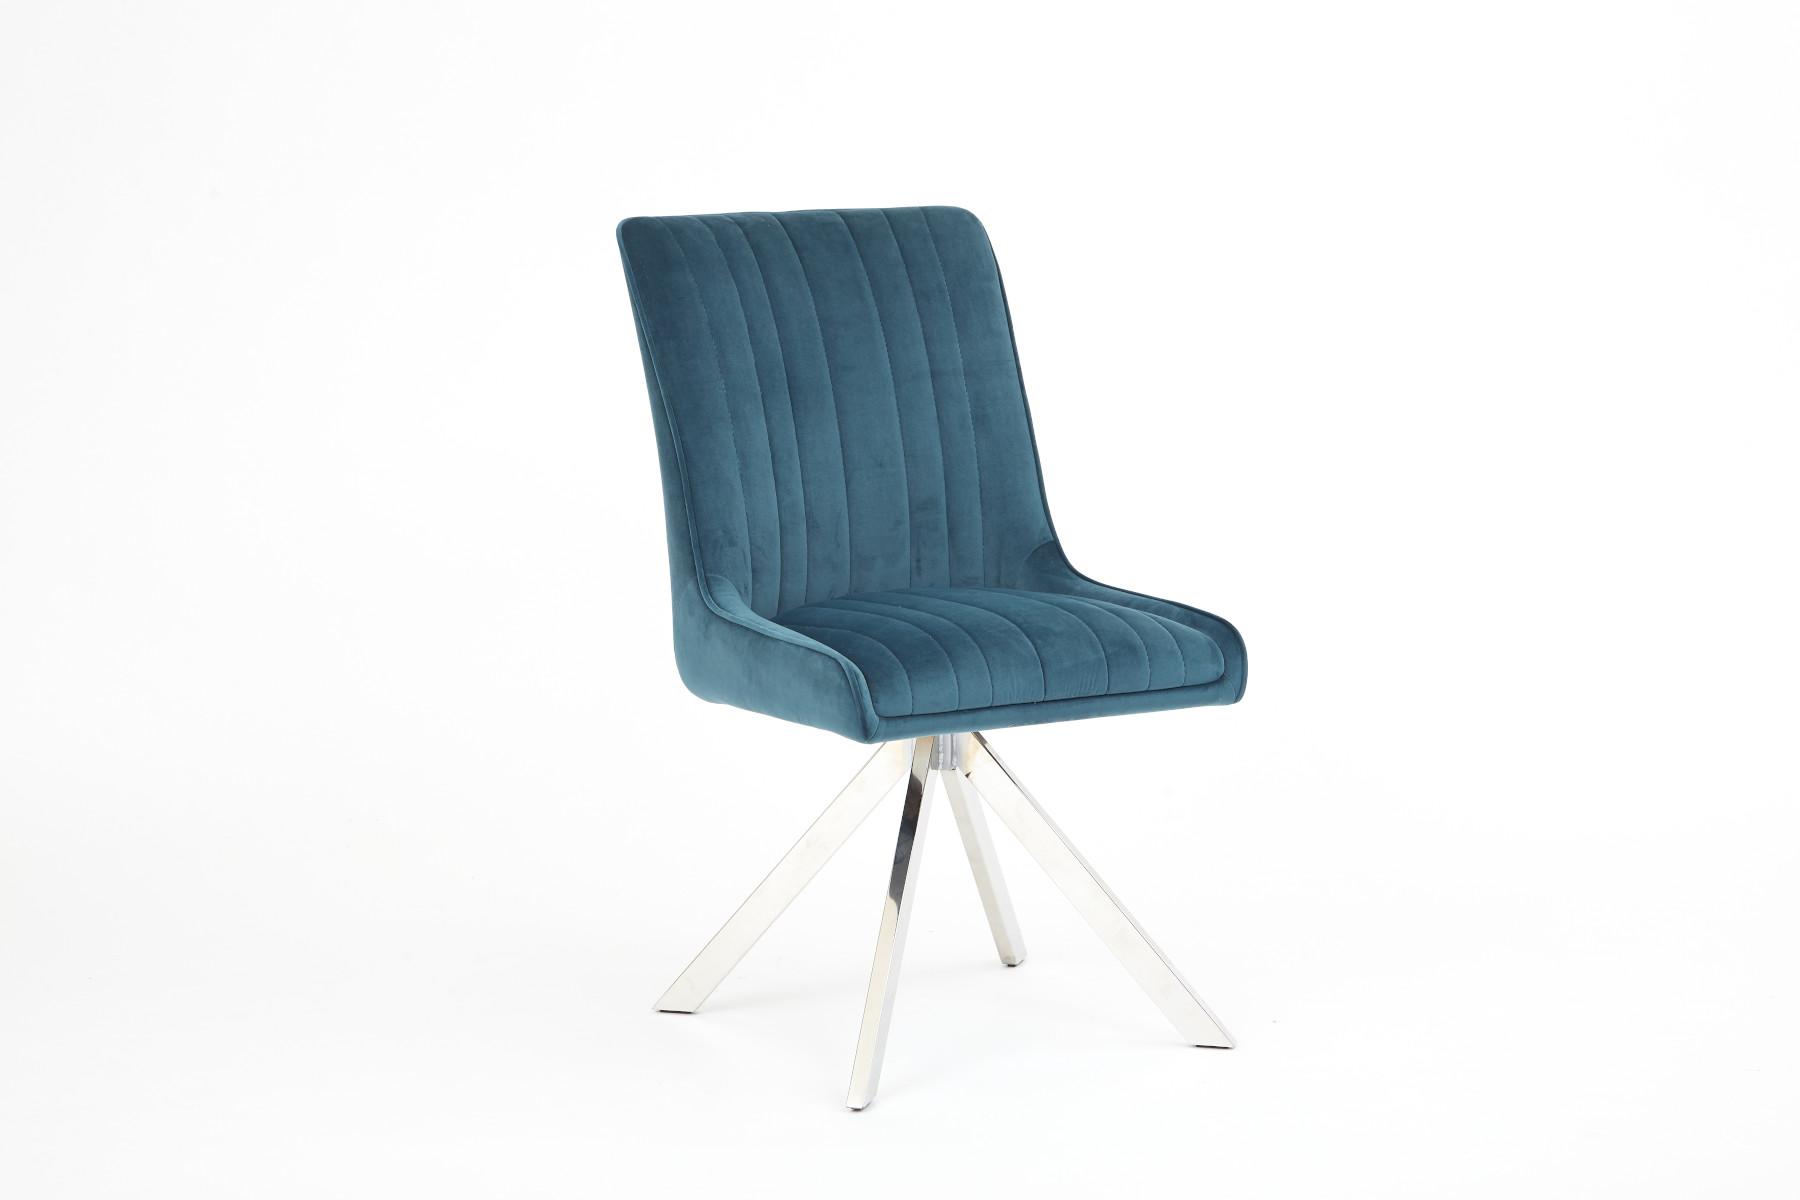 Shauna Teal Dining Chair